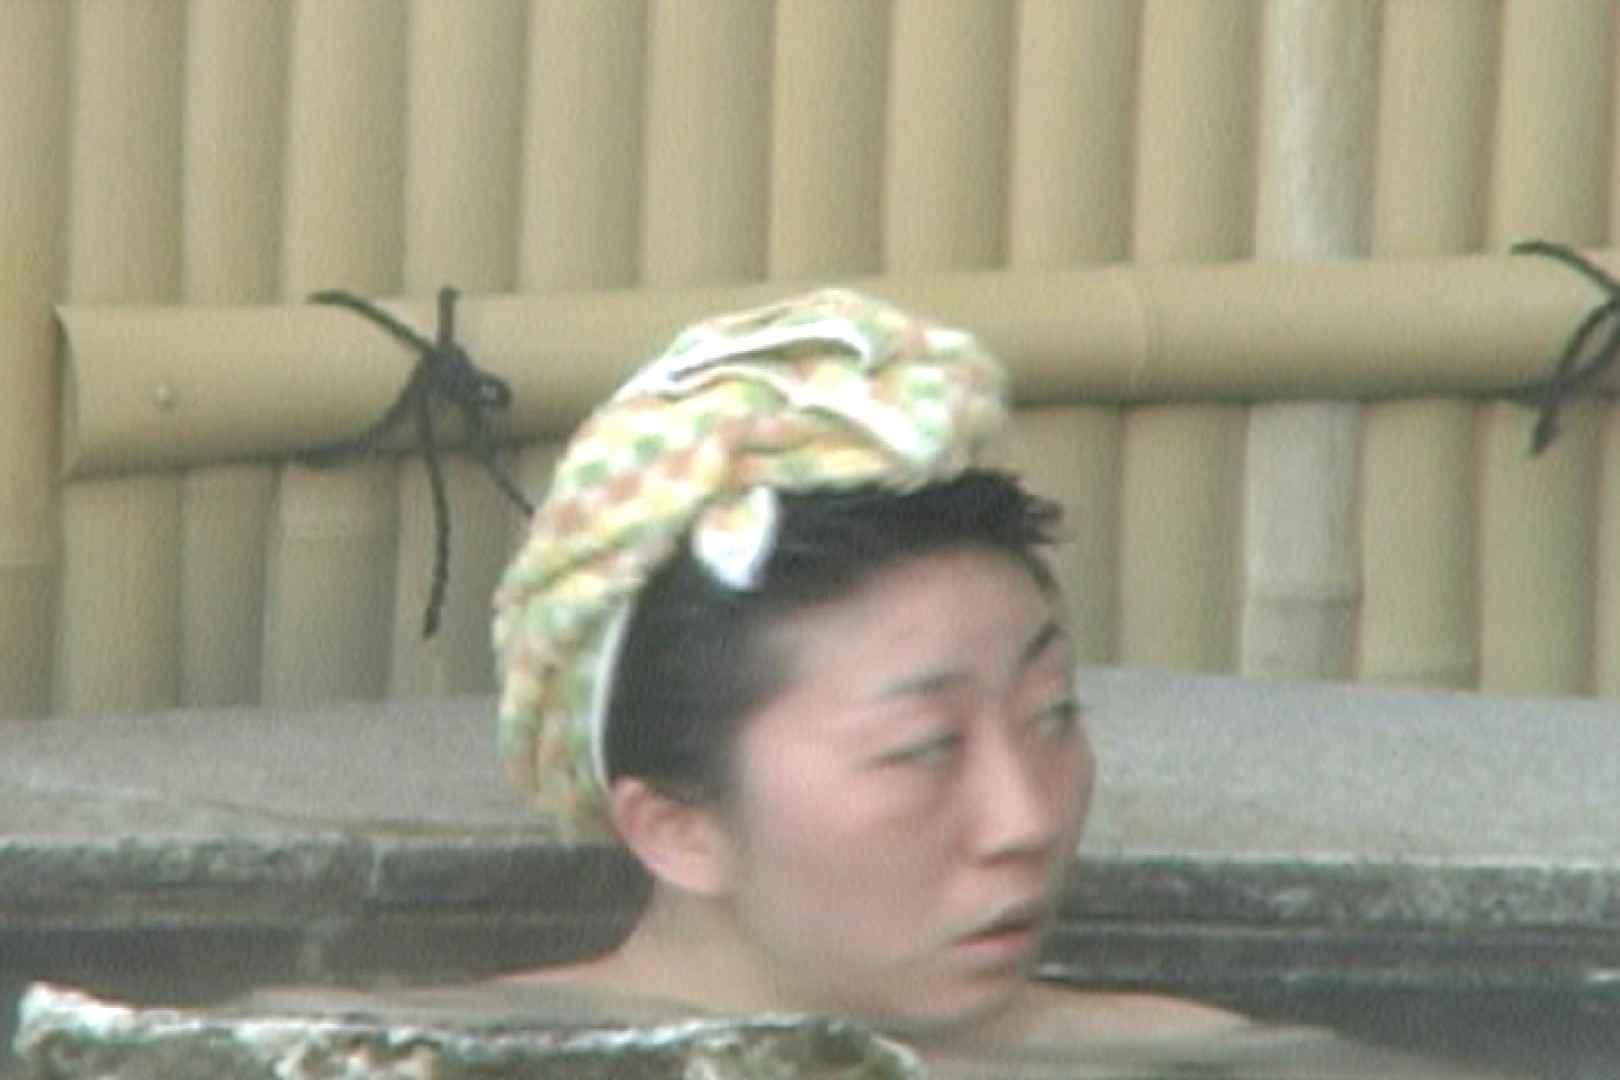 Aquaな露天風呂Vol.594 盗撮師作品 | 露天風呂突入  79pic 46